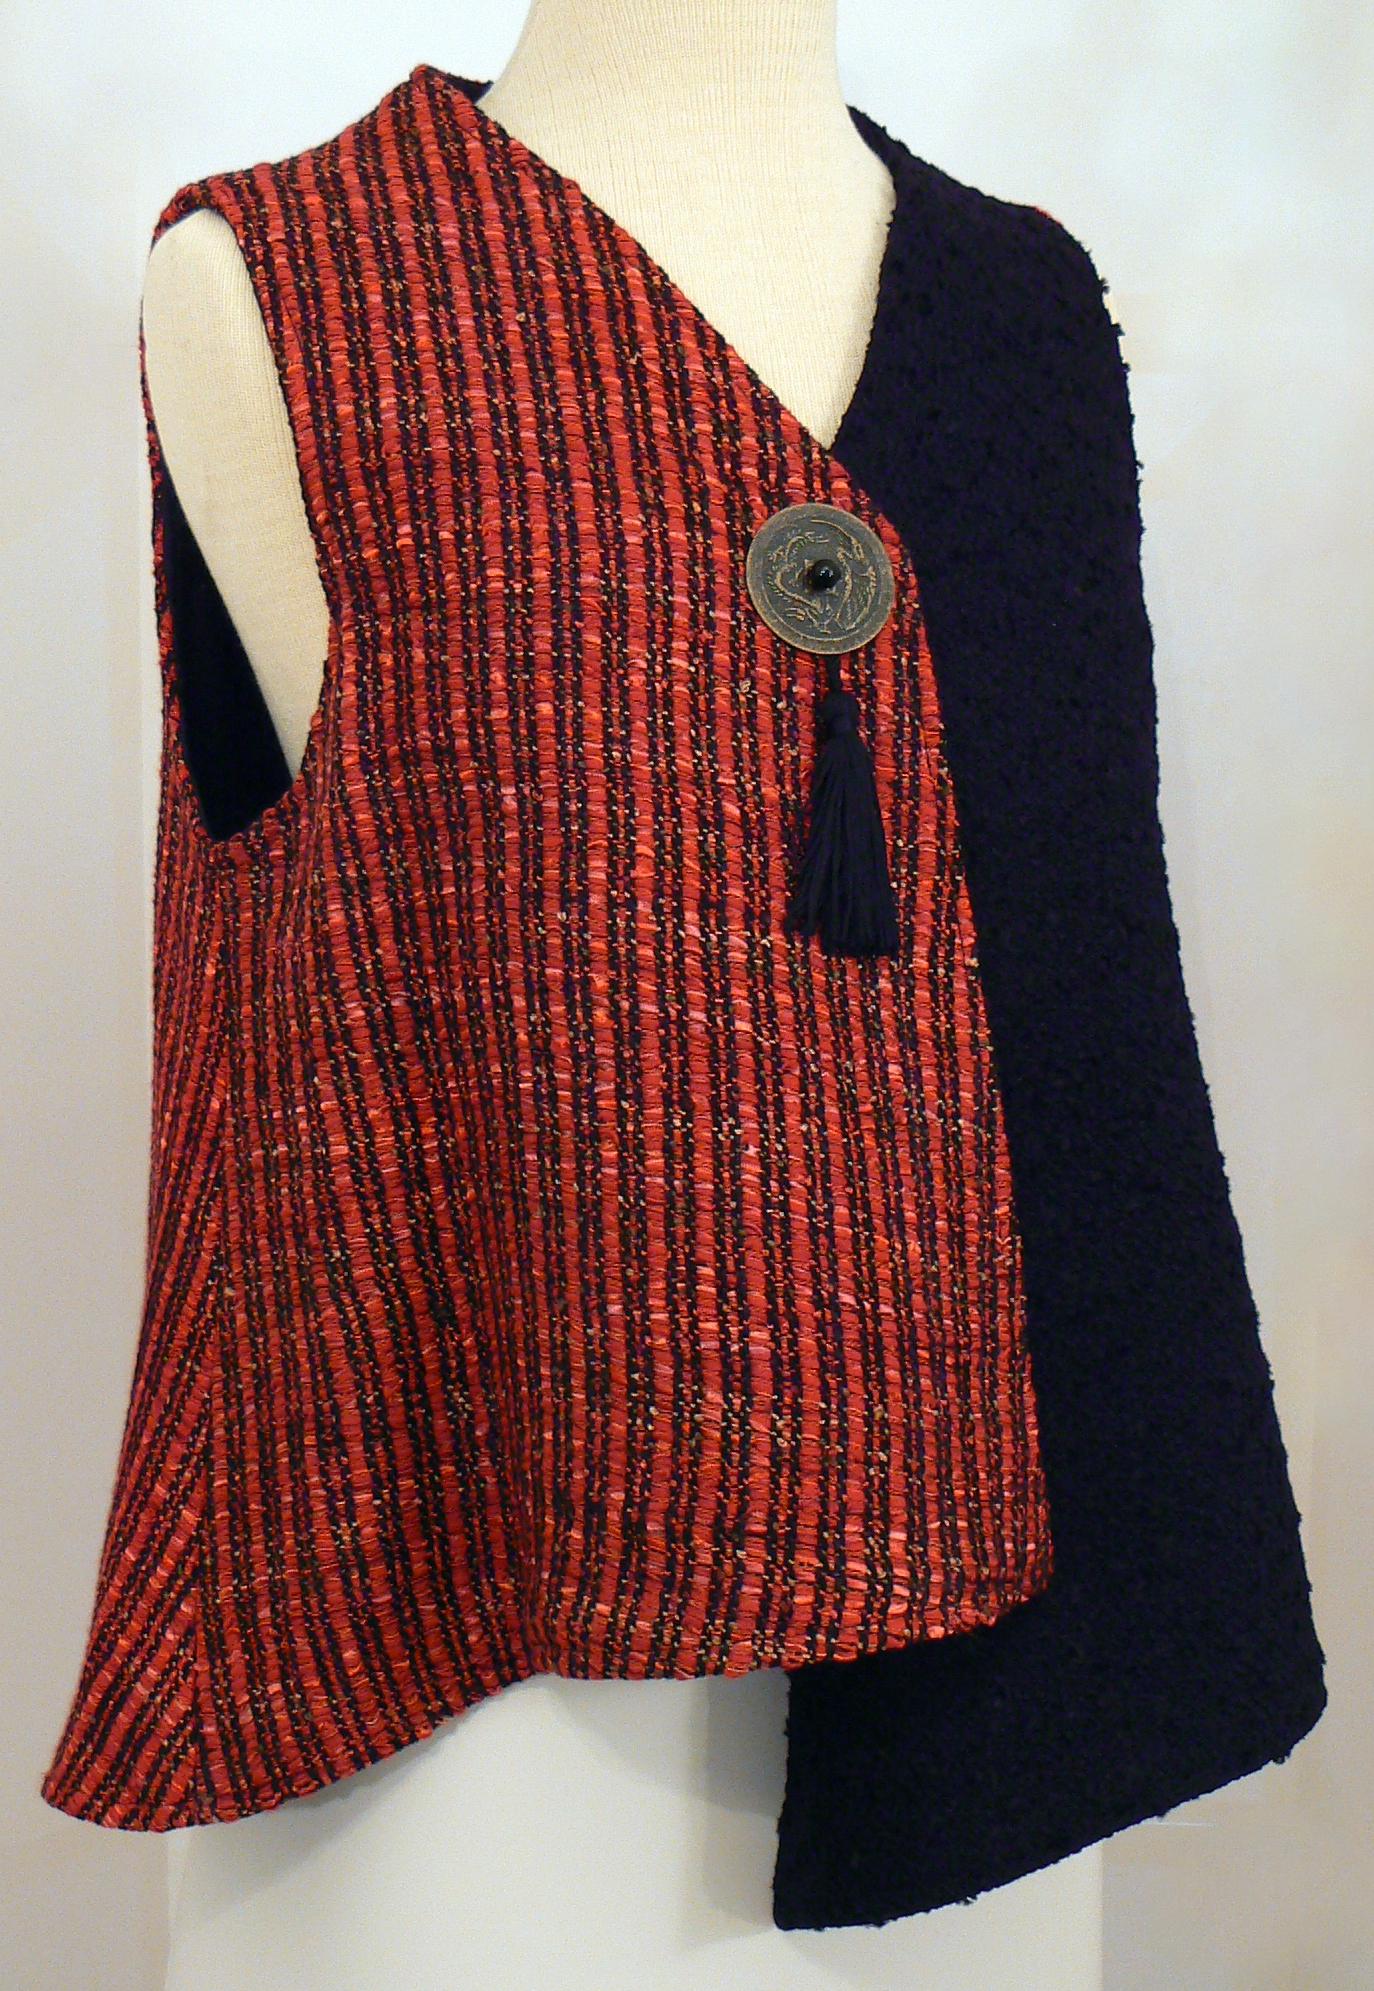 Handwoven Clothing, Vest, Kathleen Weir-West, 36-001.JPG